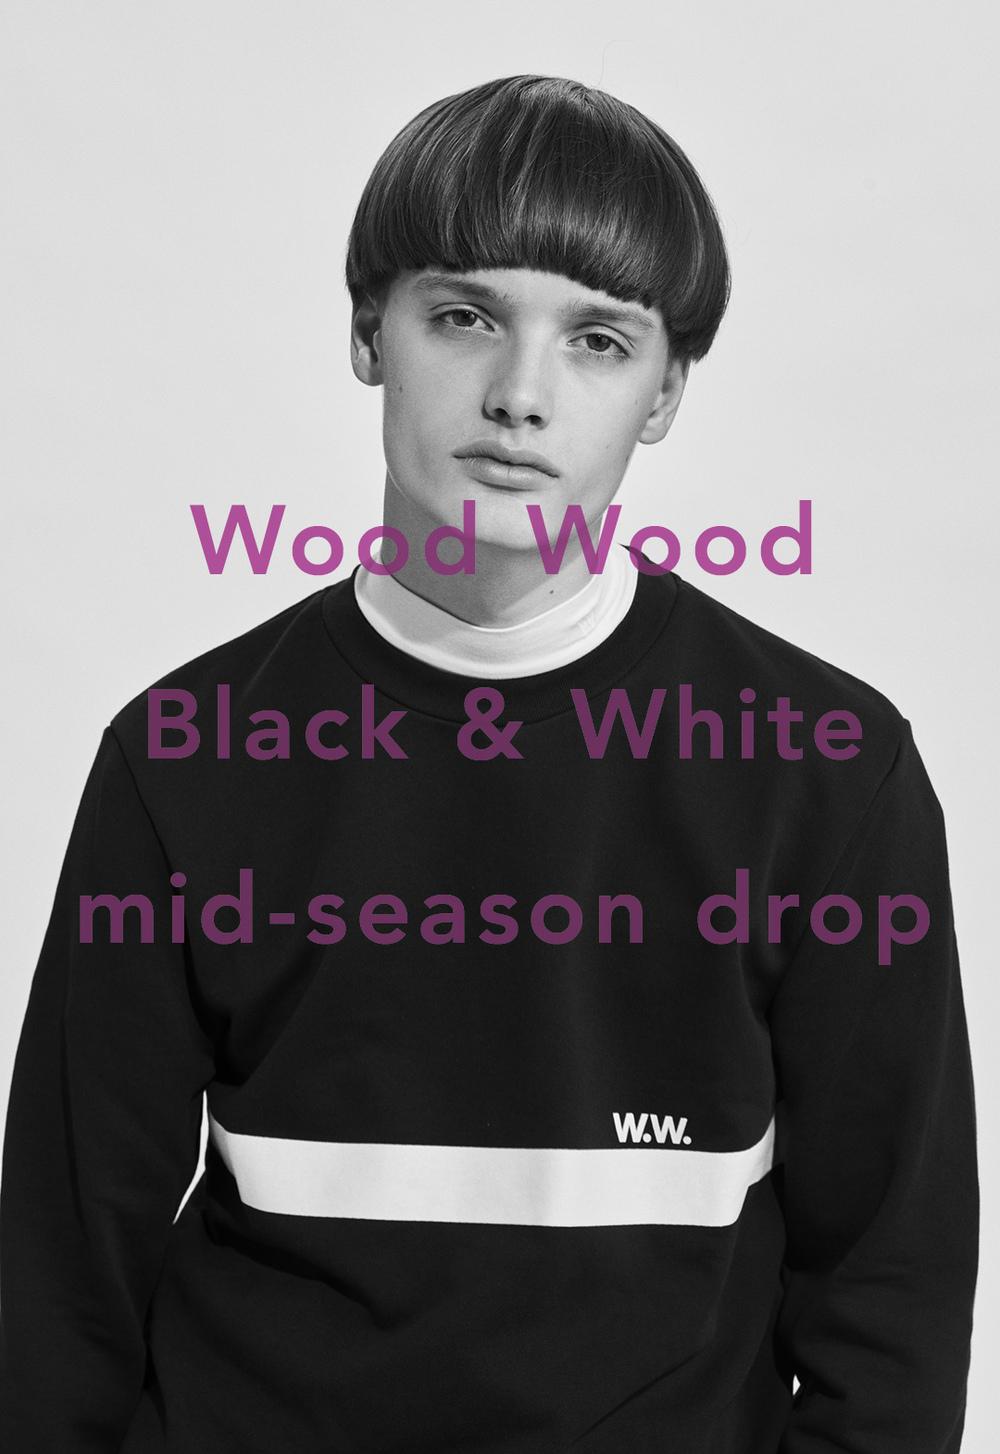 WoodWood_10sep_024314_1080.jpg